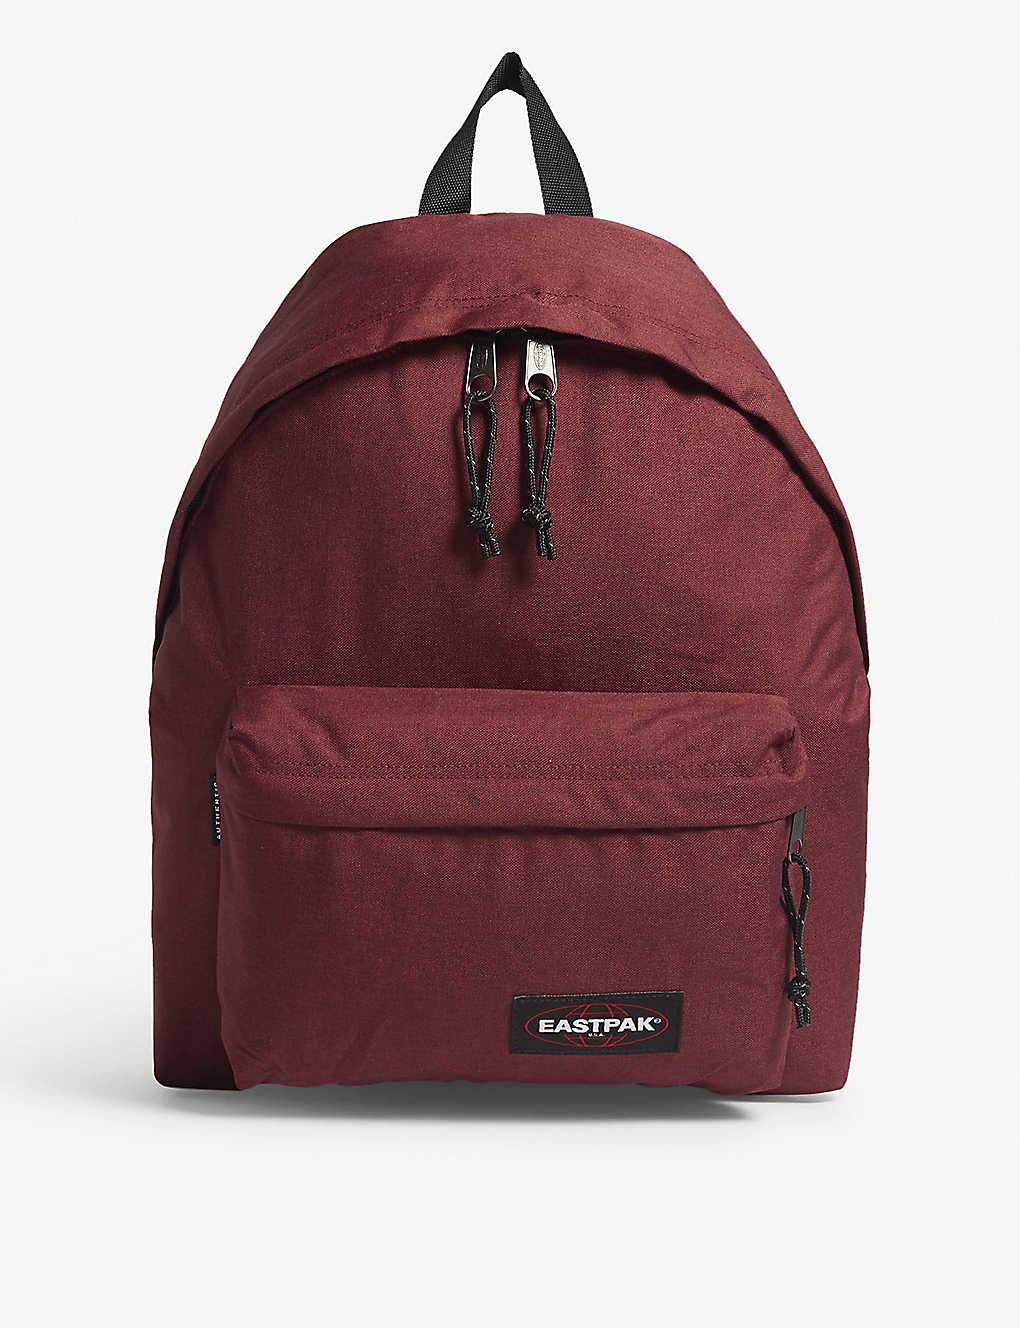 0dedc2091f EASTPAK - Padded Pak'r backpack | Selfridges.com